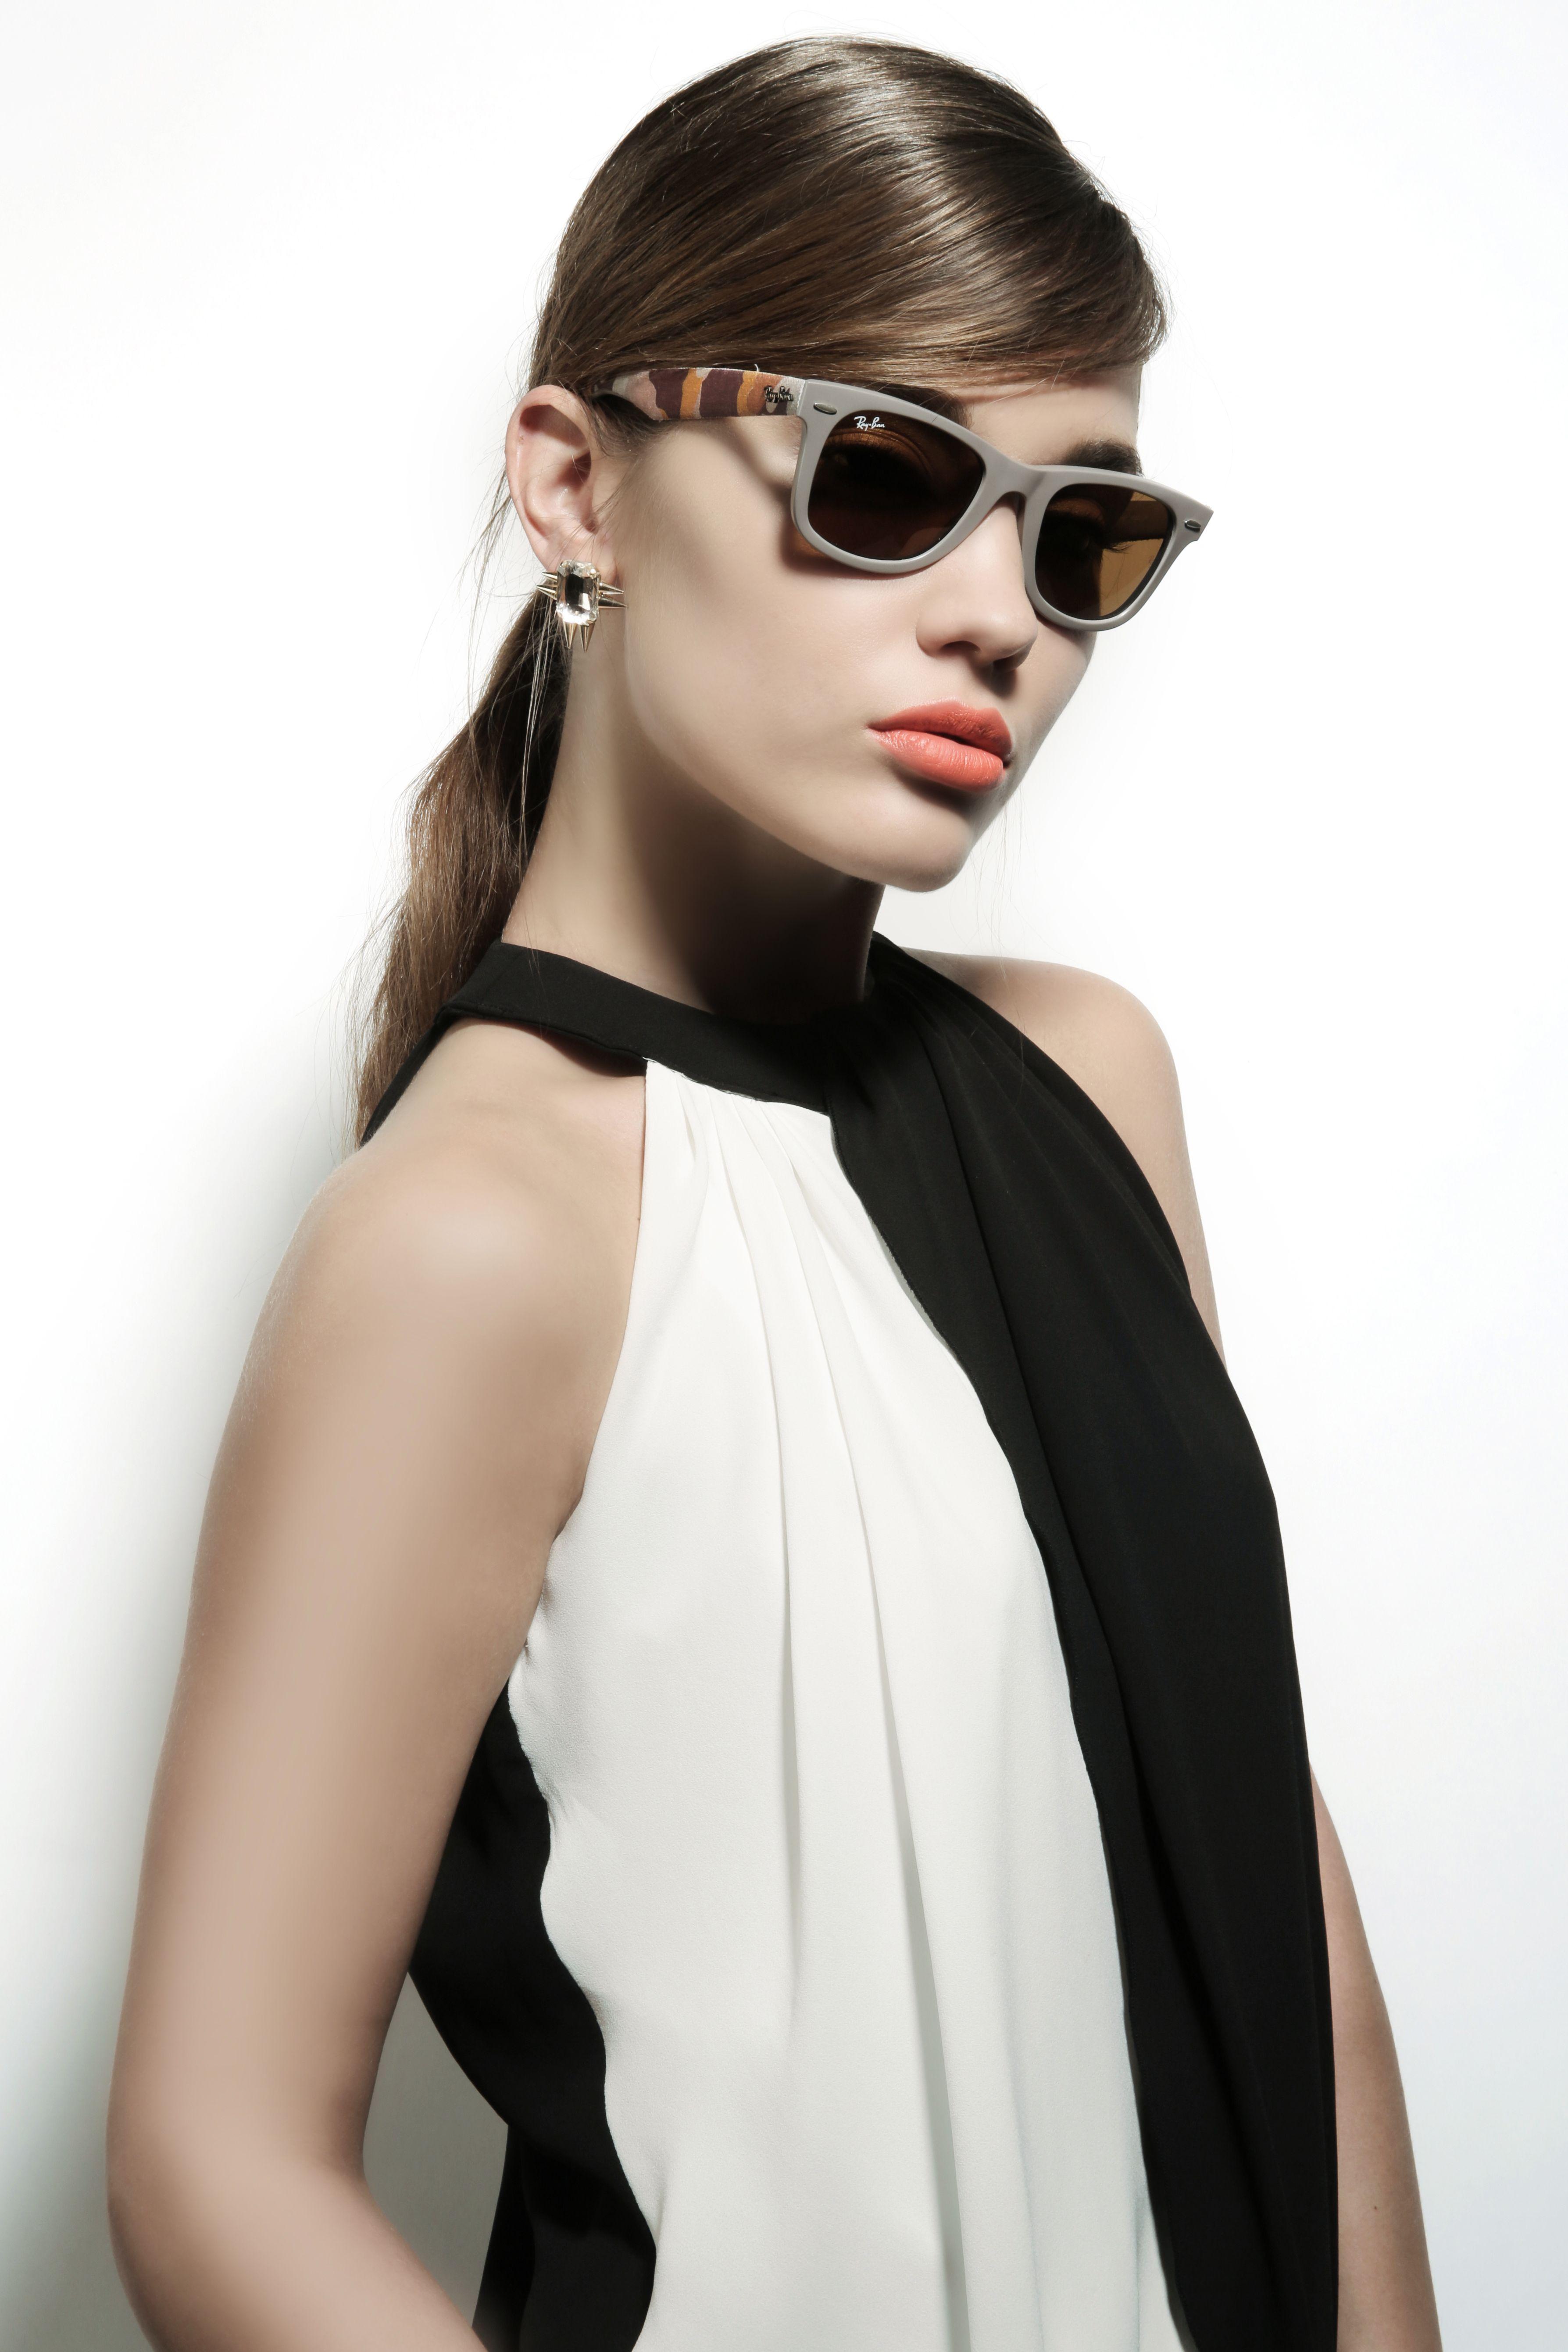 Boyner Sunglasses Trend Yaz Sun Cool Gozluk Fashion Moda Style Mysterious Attractive Elegant Gunes Summer Summer2014 Moda Trendler Gozluk